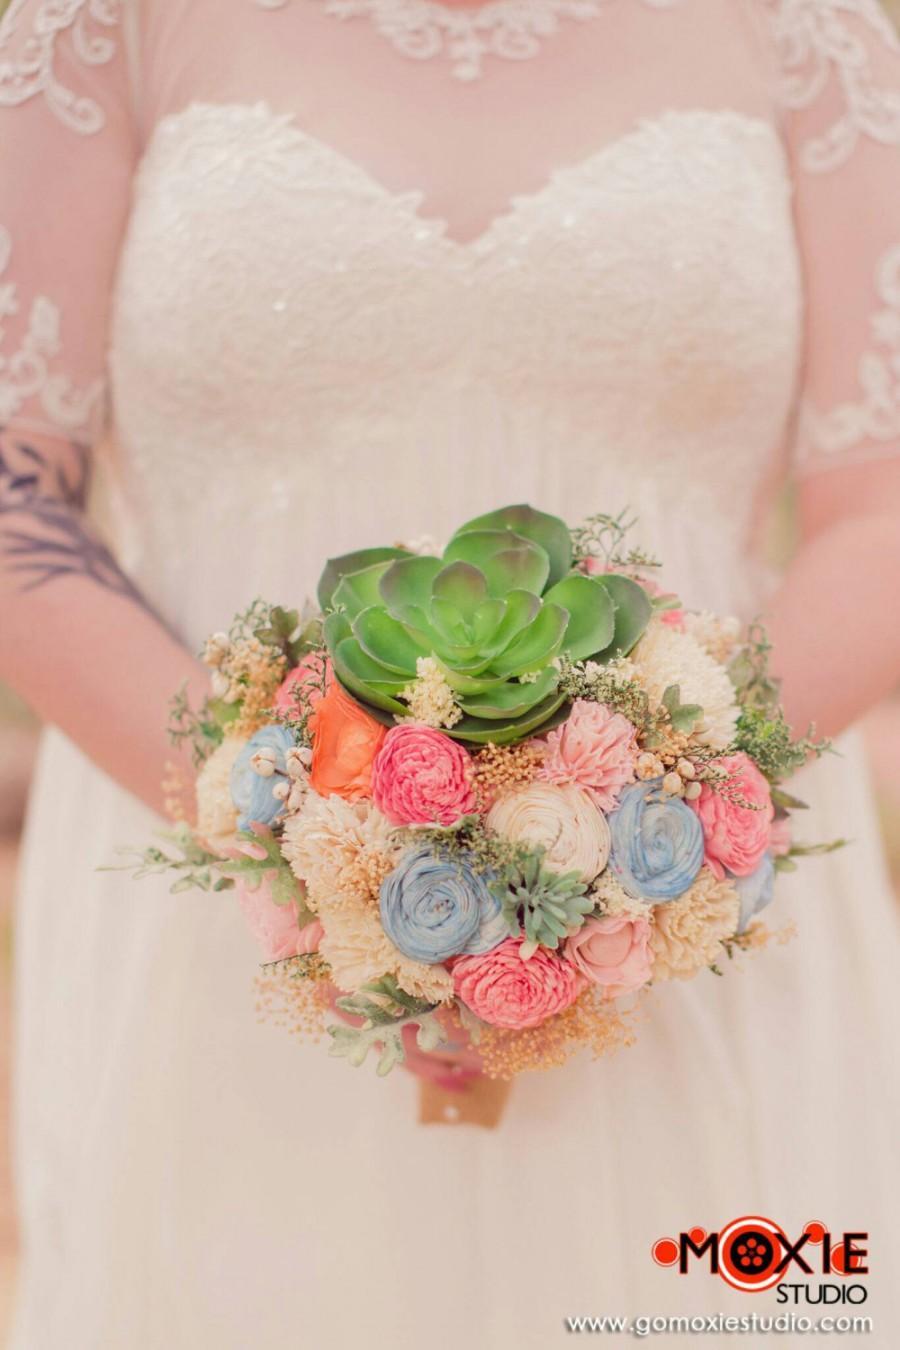 Hochzeit - Alternative Bridal Bouquet - Succulents, Dusty Miller, Sola Flowers, Keepsake Bouquet, Sola Bouquet, Rustic Wedding